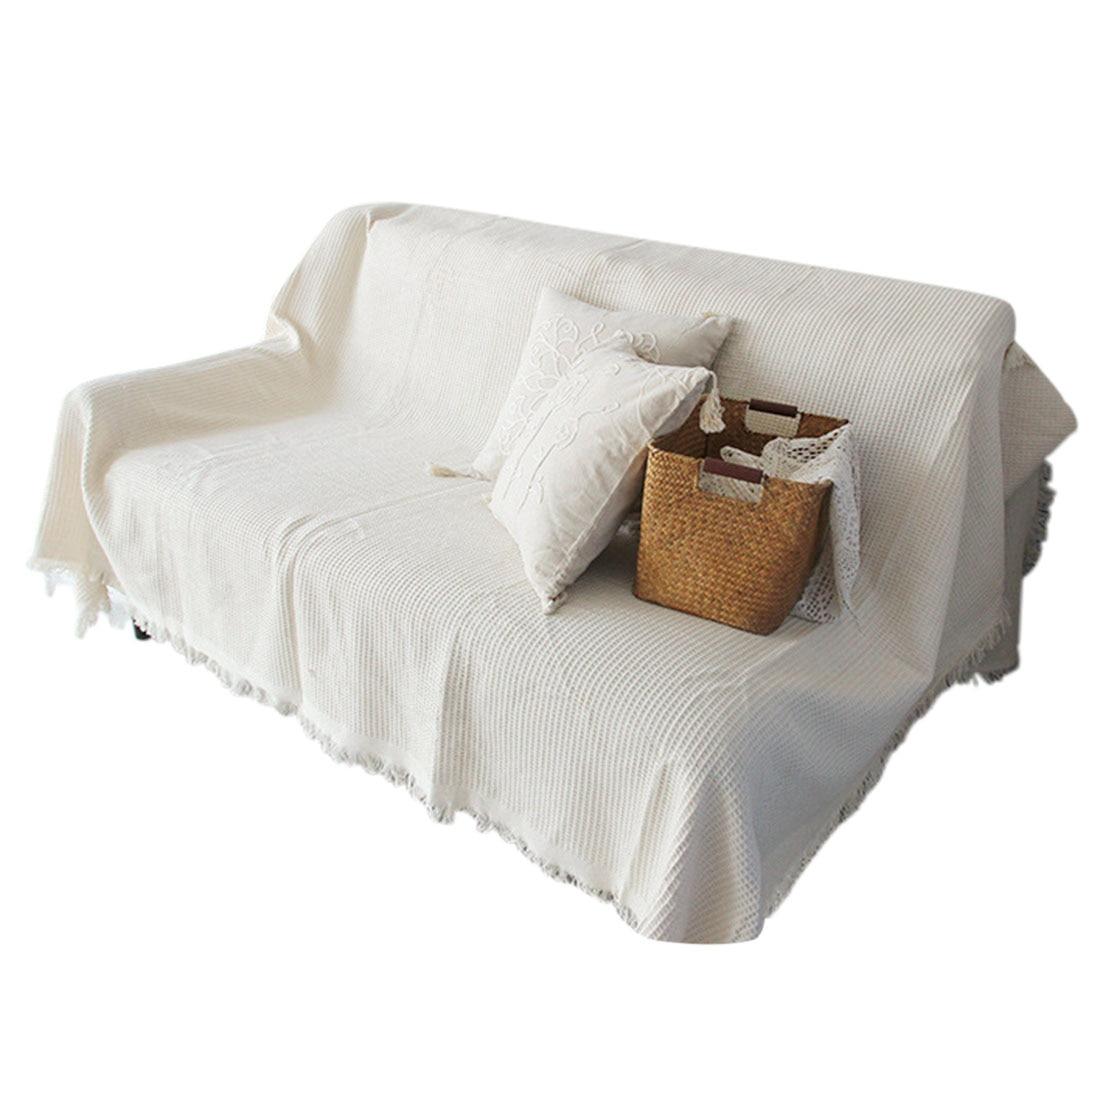 Sofa Armchair Covers: High Quality Sofa Towel Blanket Slipcover Sofa Covers For